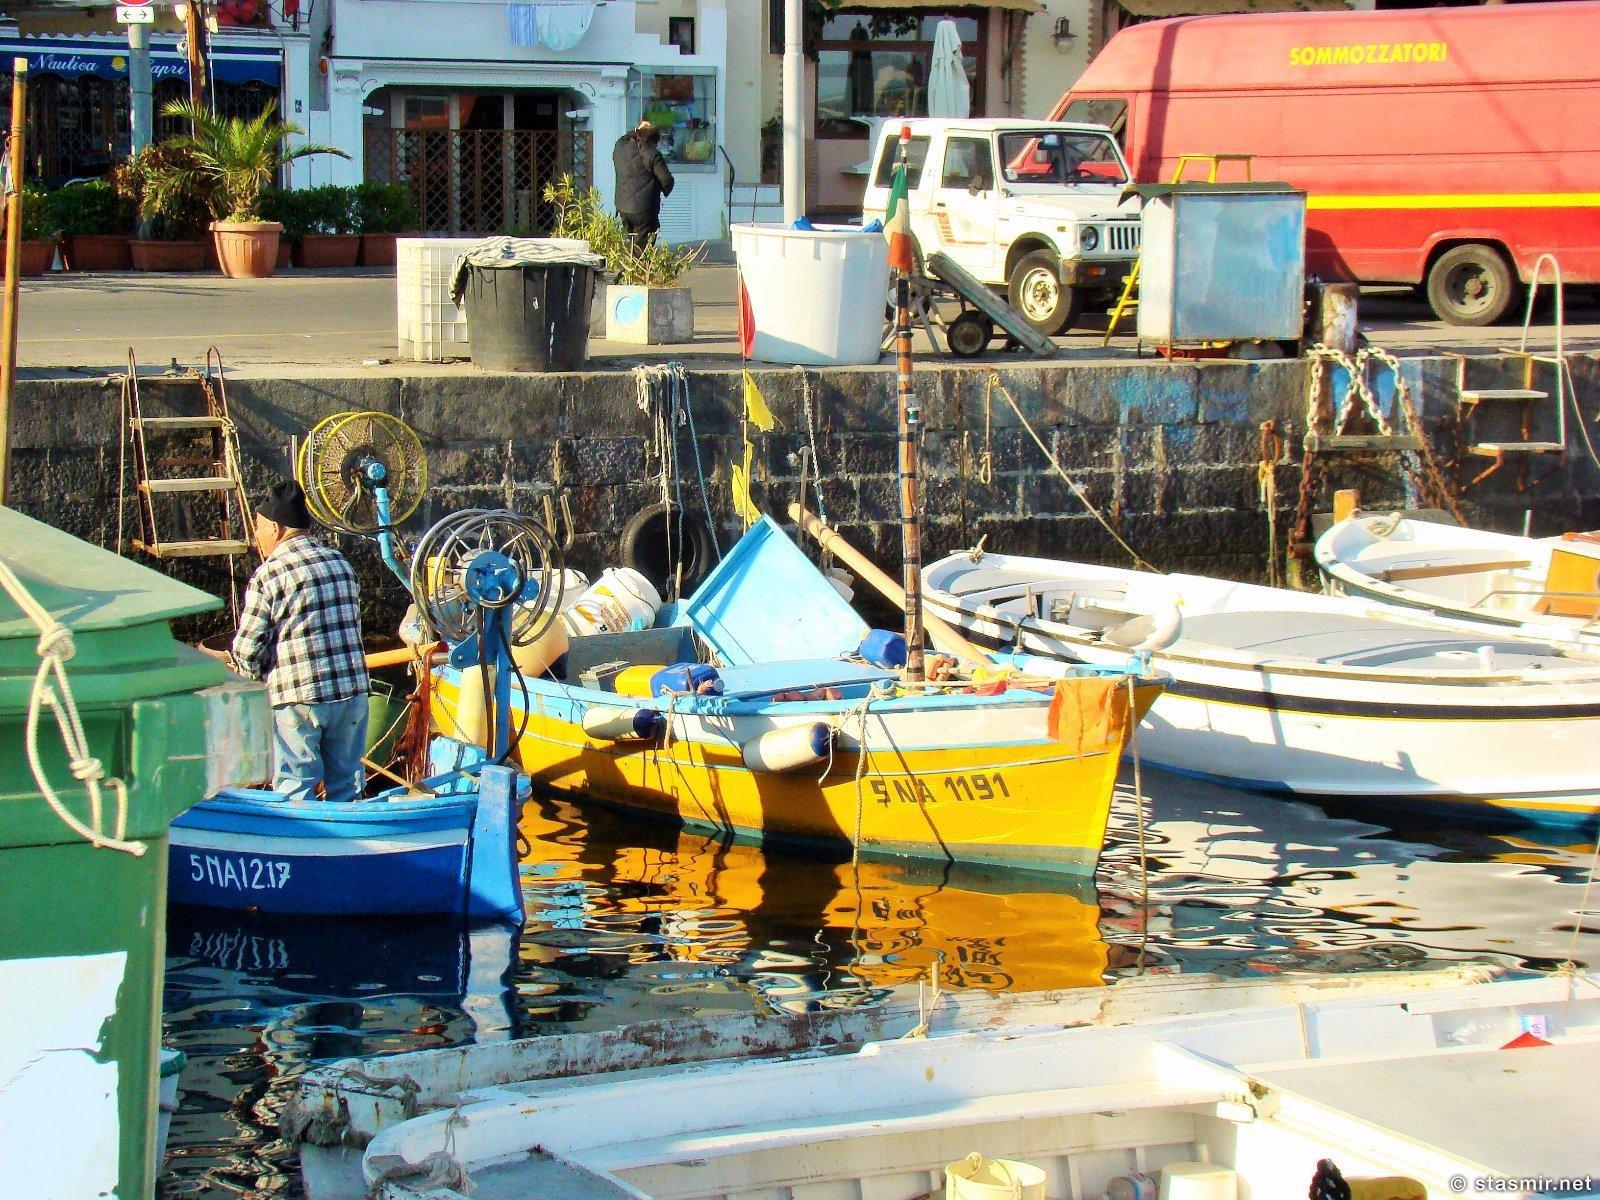 Isola Di Capri, остров Капри, фото Стасмир, Photo Stasmir